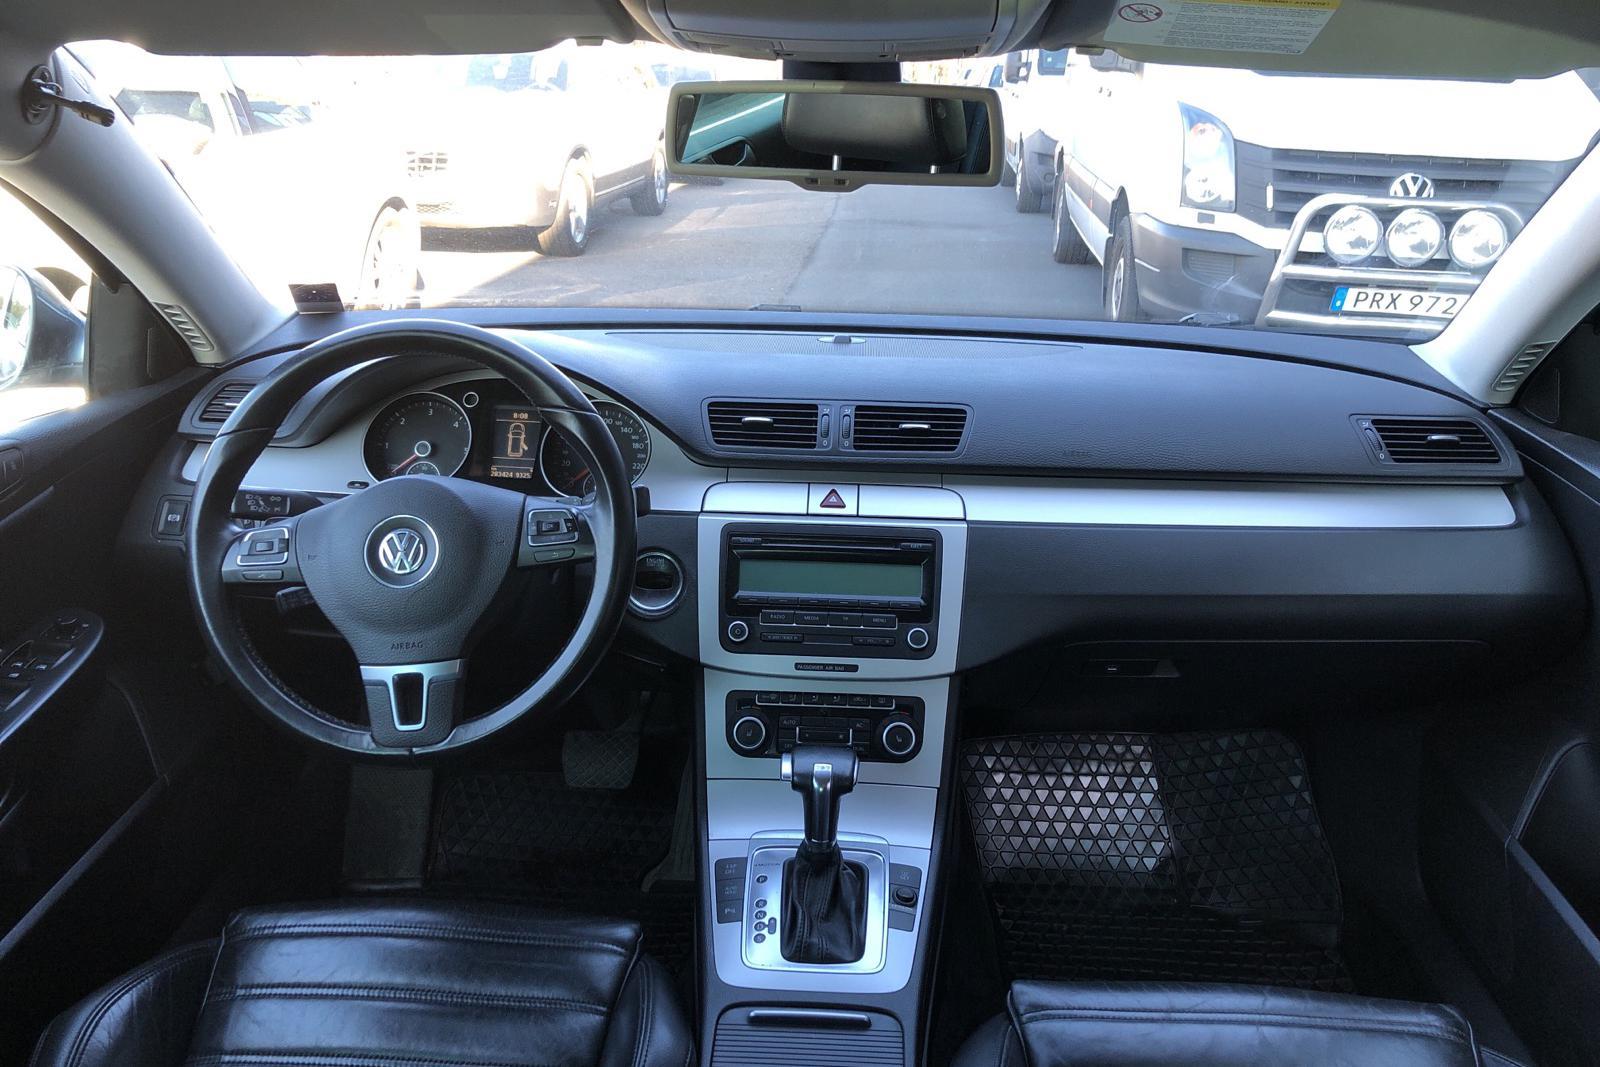 VW Passat 2.0 TDI 4-Motion Variant (170hk) - 283 400 km - Automatic - Light Grey - 2010